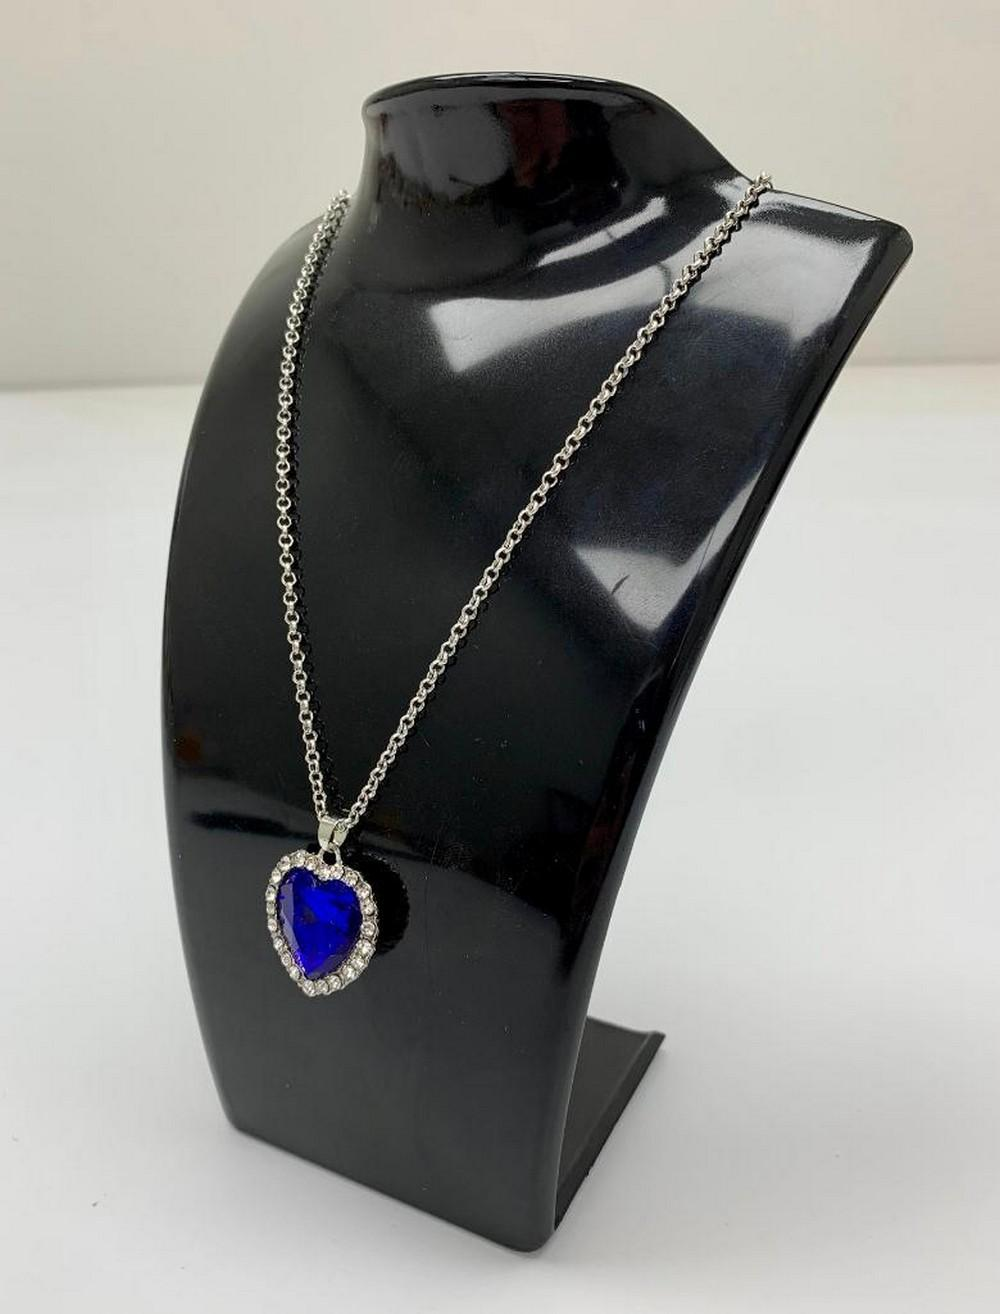 Ladies Midnight Blue Semi-precious Gemstone Heart